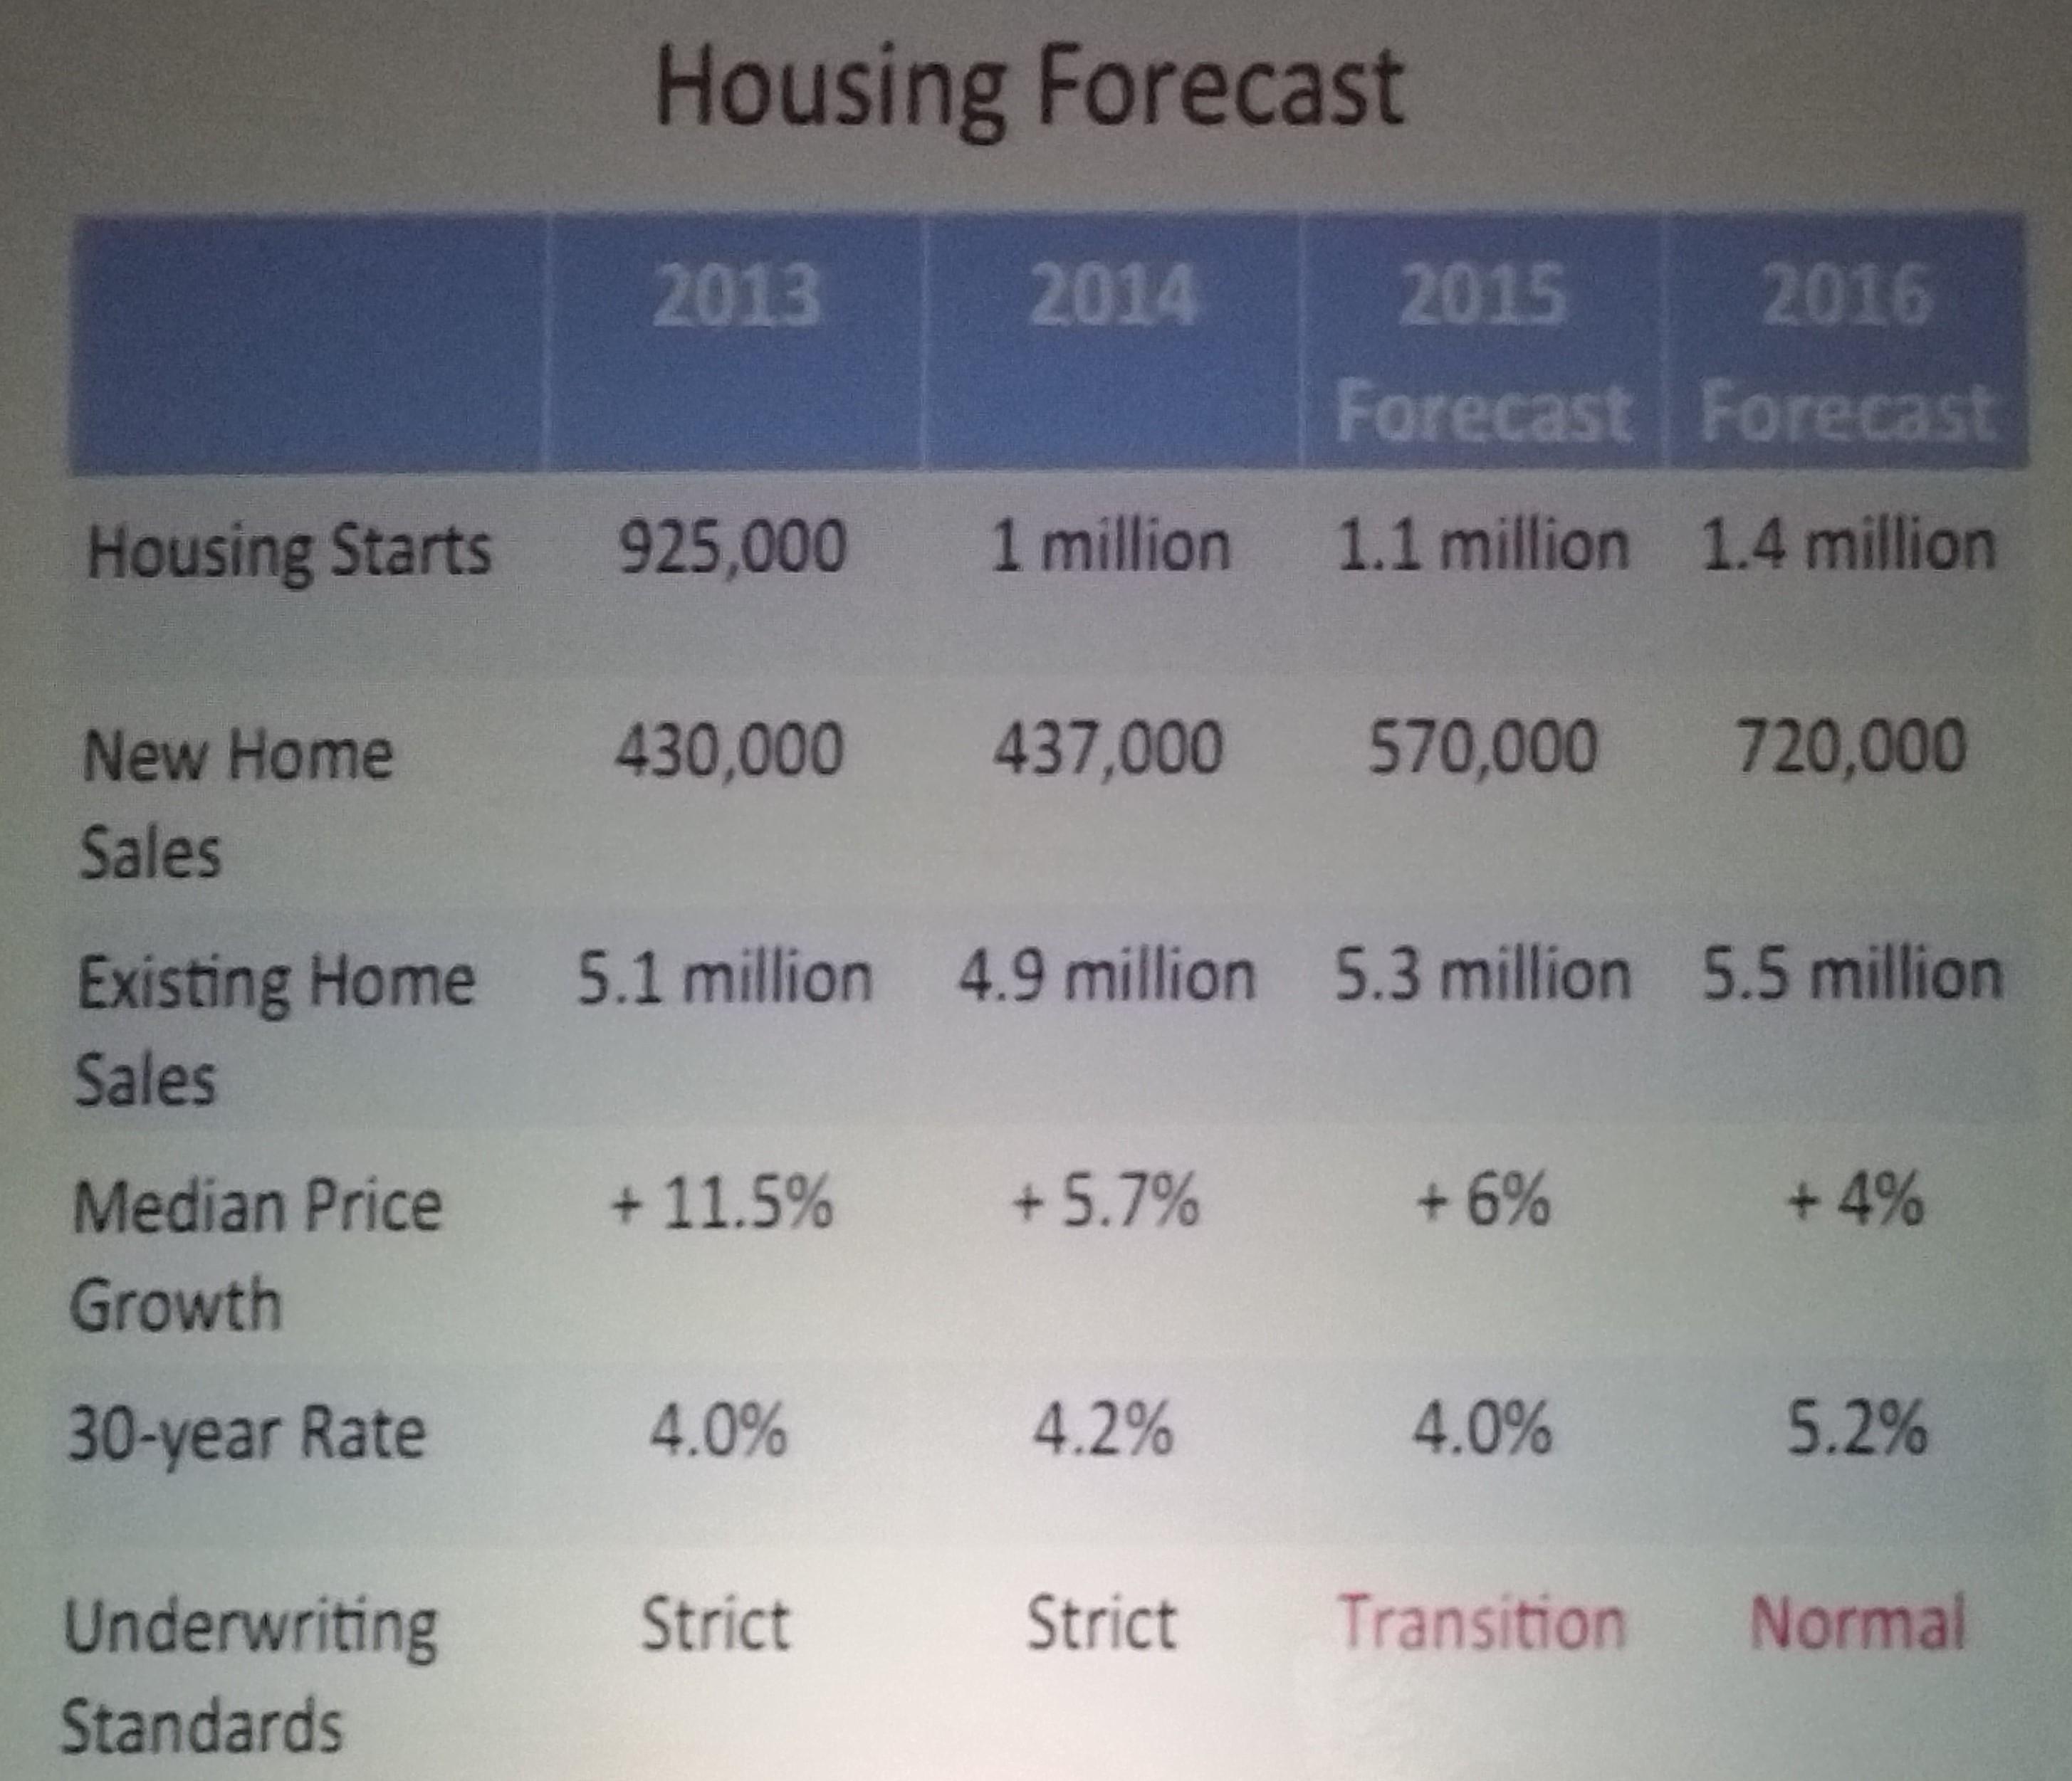 Housing Forecast